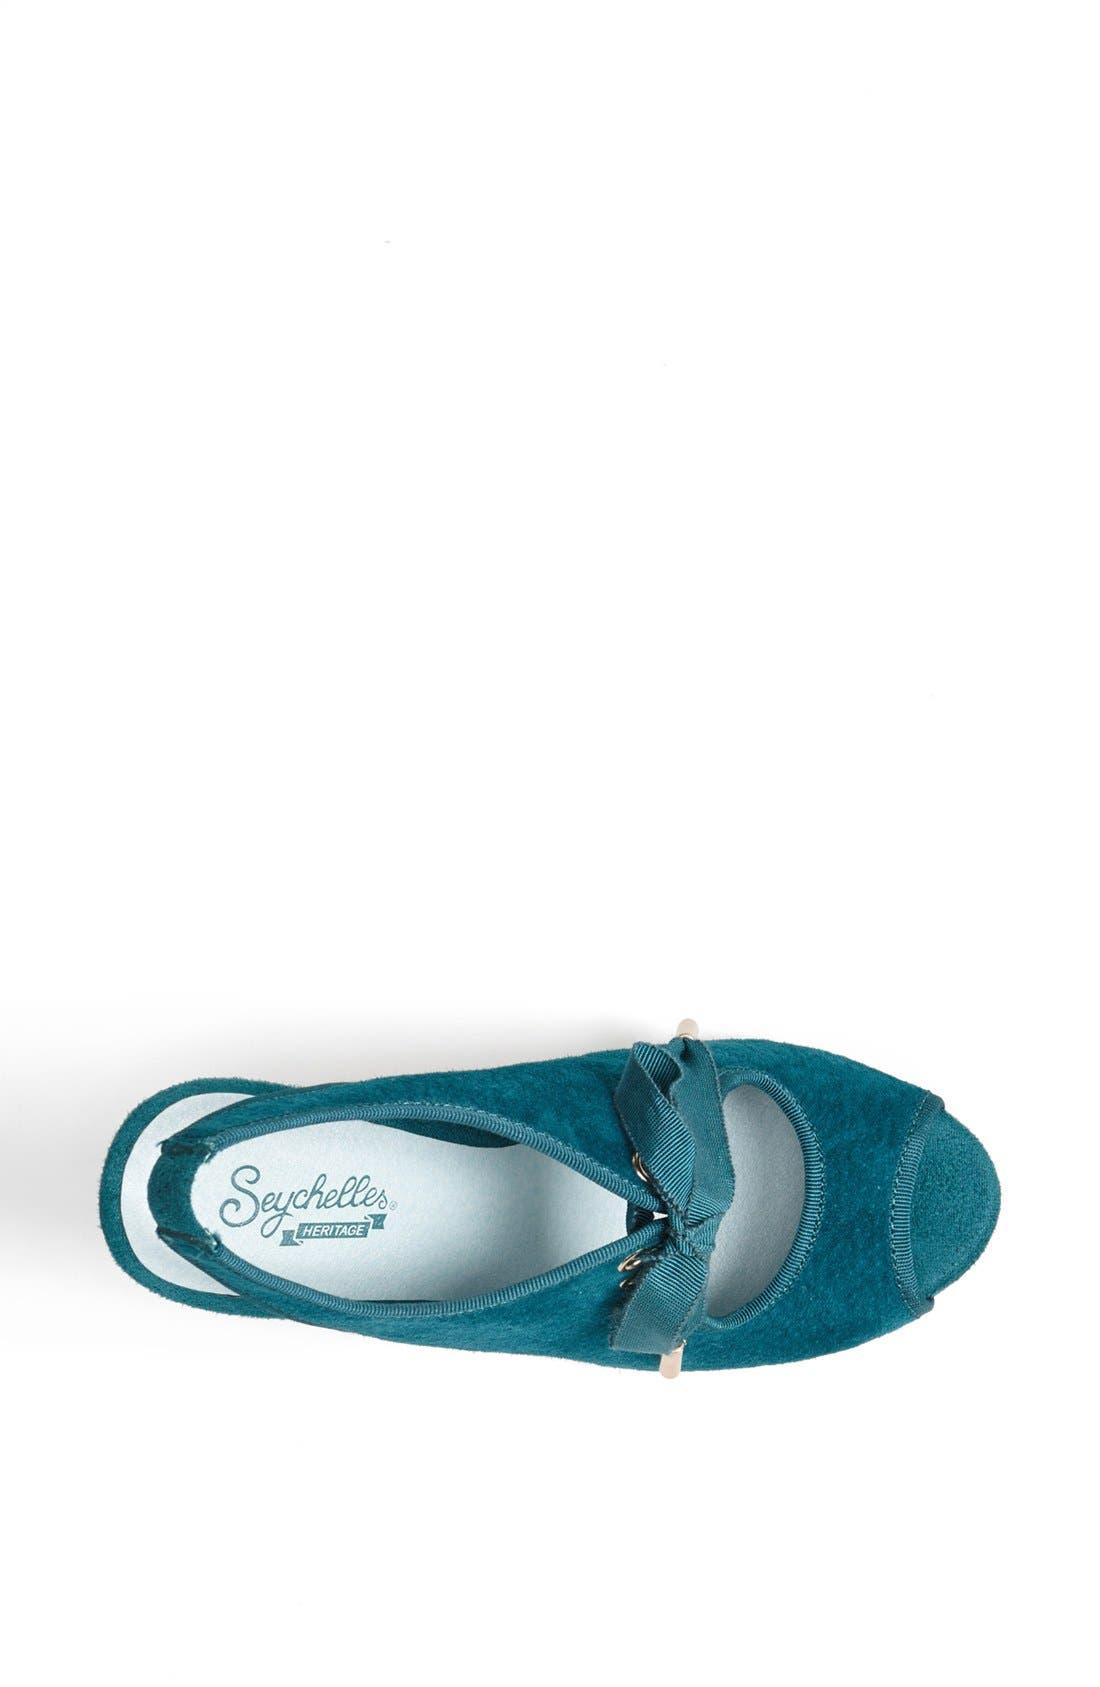 Alternate Image 3  - Seychelles 'Phenomenon' Sandals